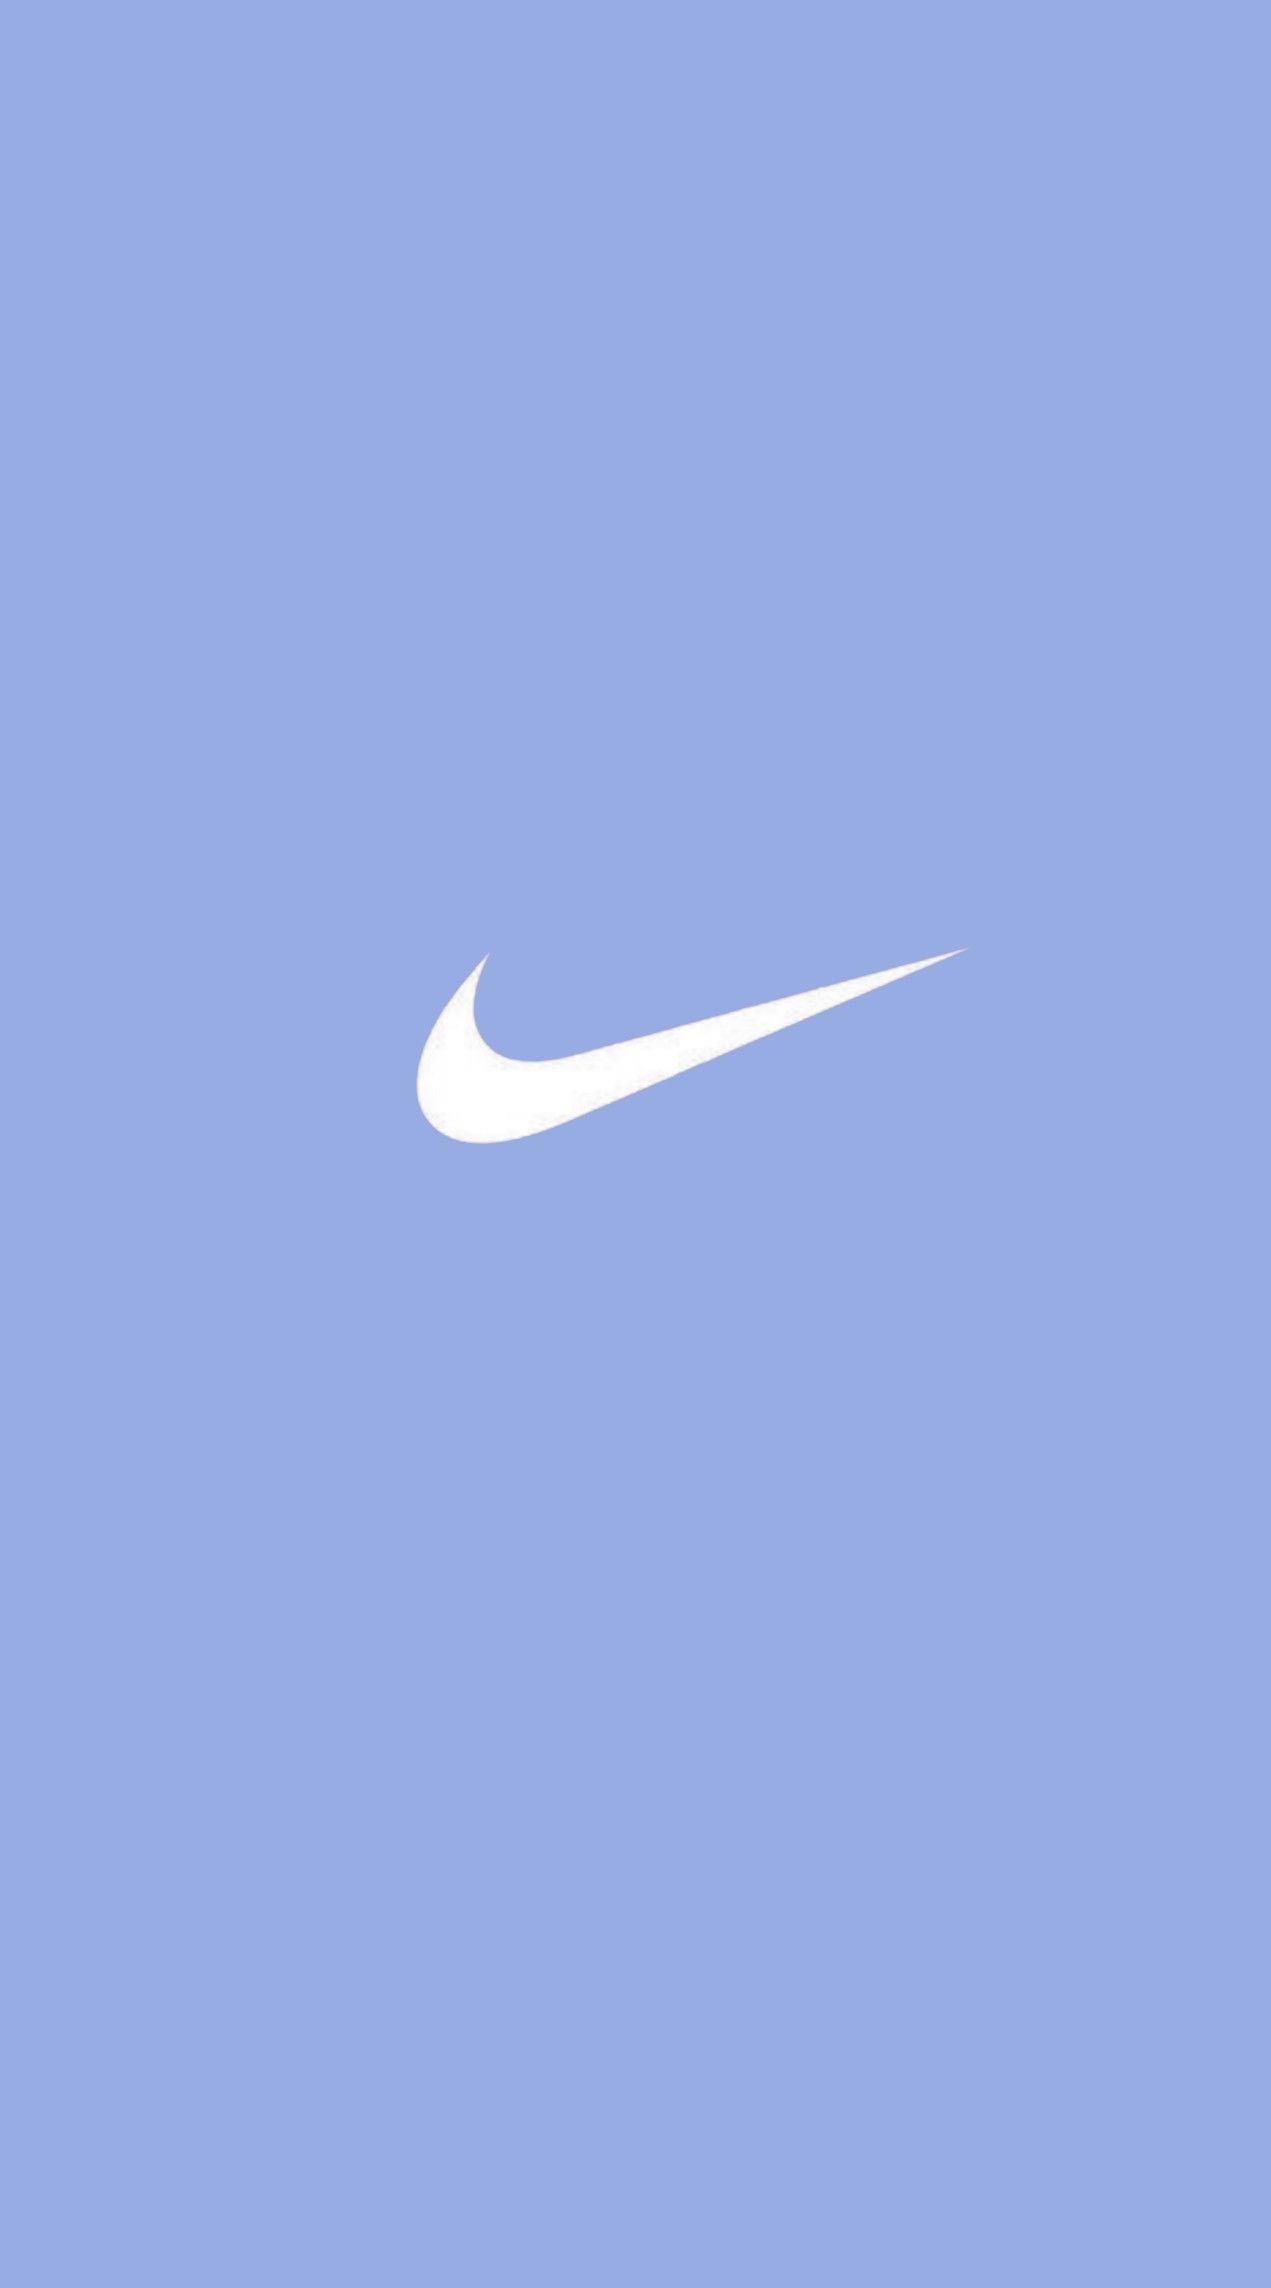 37++ Nike wallpaper iphone Free